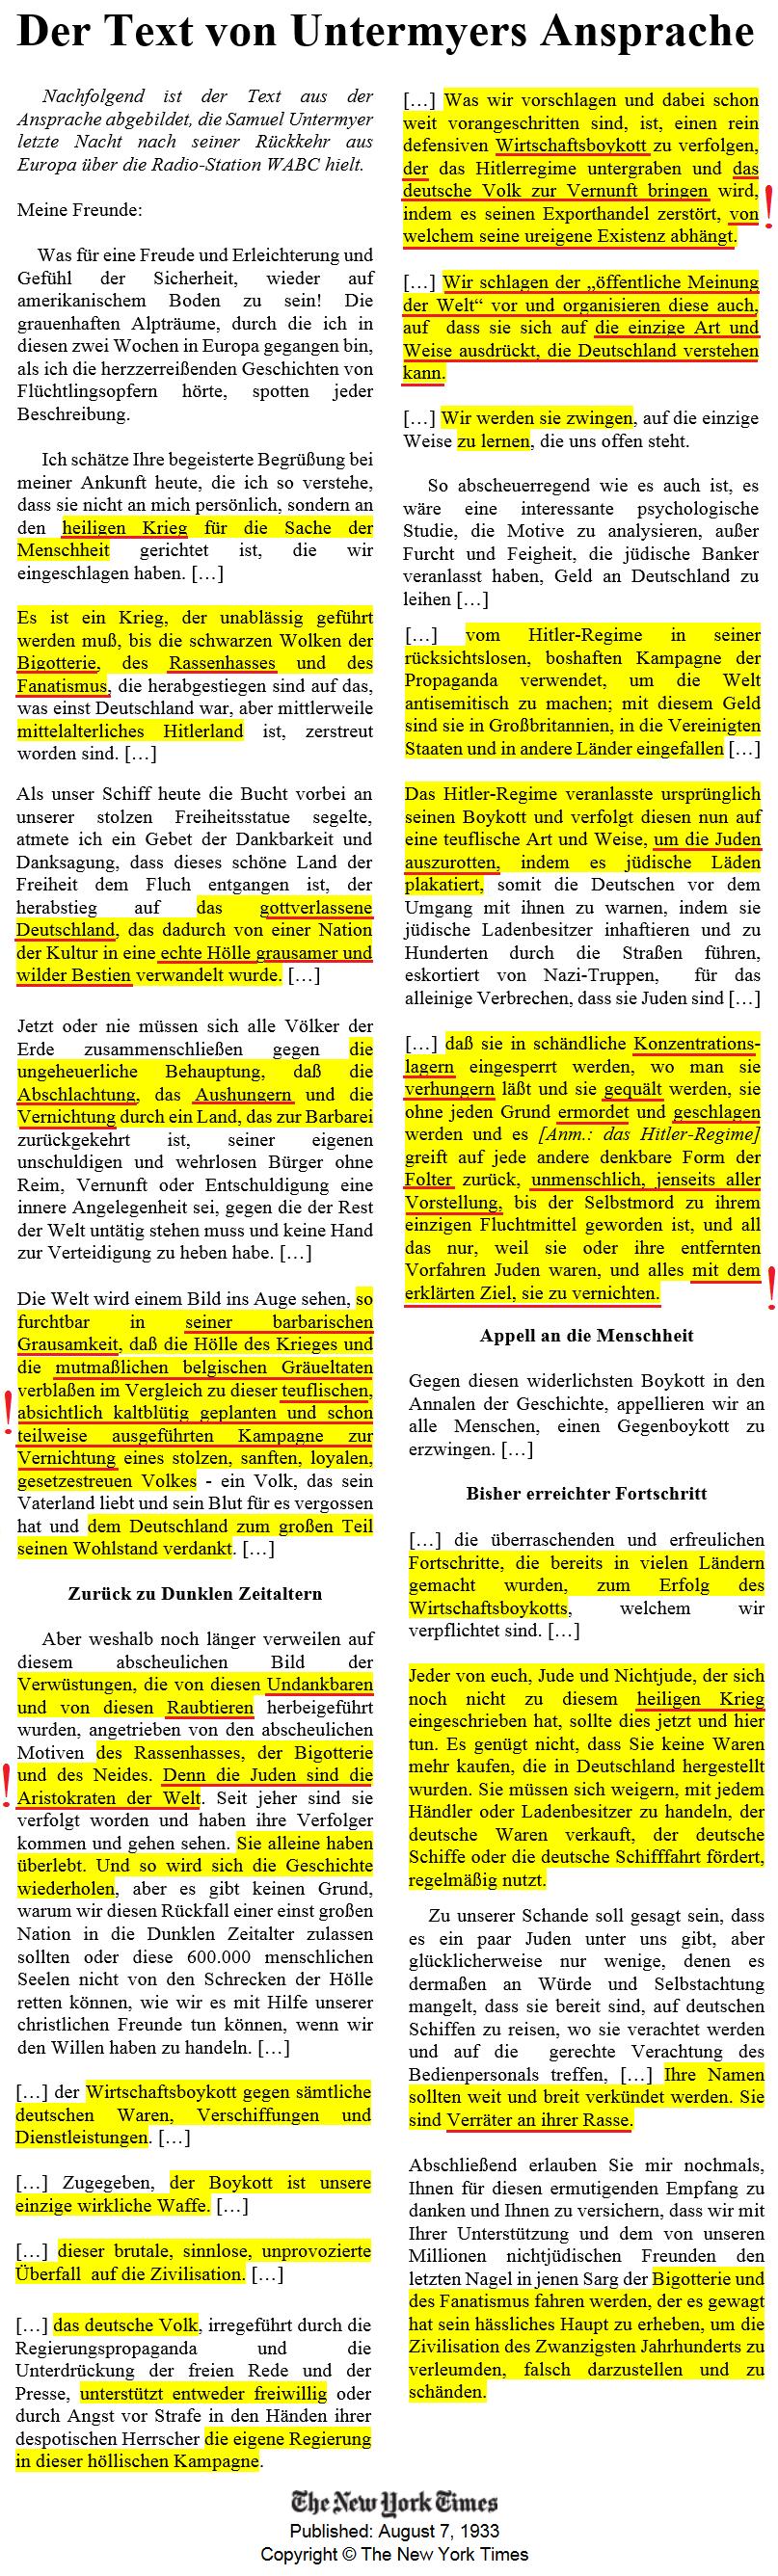 1933_08_07_NYT_Text_of_Untermyr_s_address.pdf_Foxit_Reader - Kopie 3